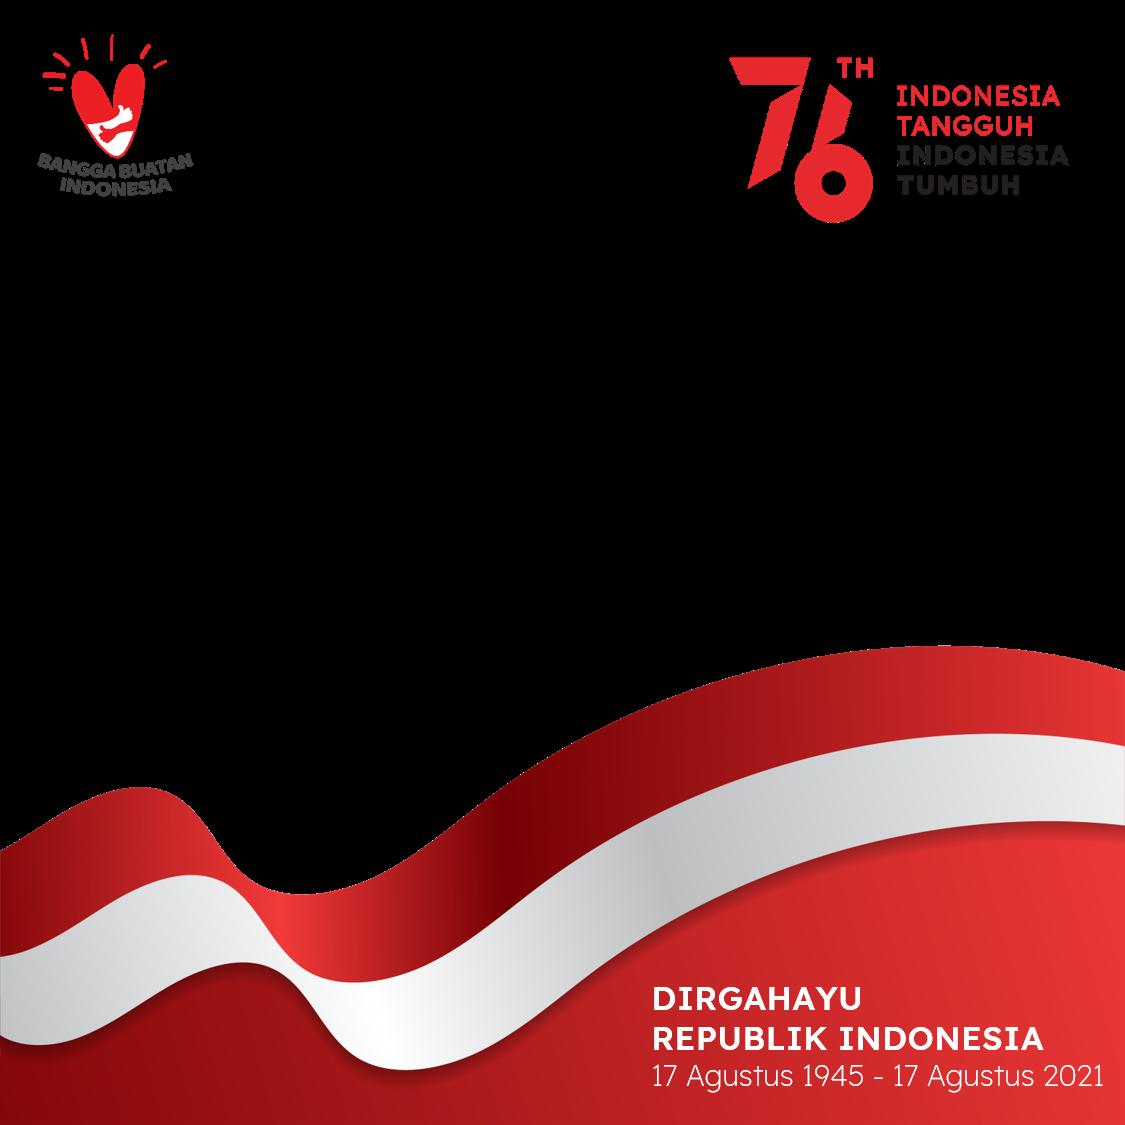 Template Background Frame Twibbon Hari Kemerdekaan 17 Agustus 2021